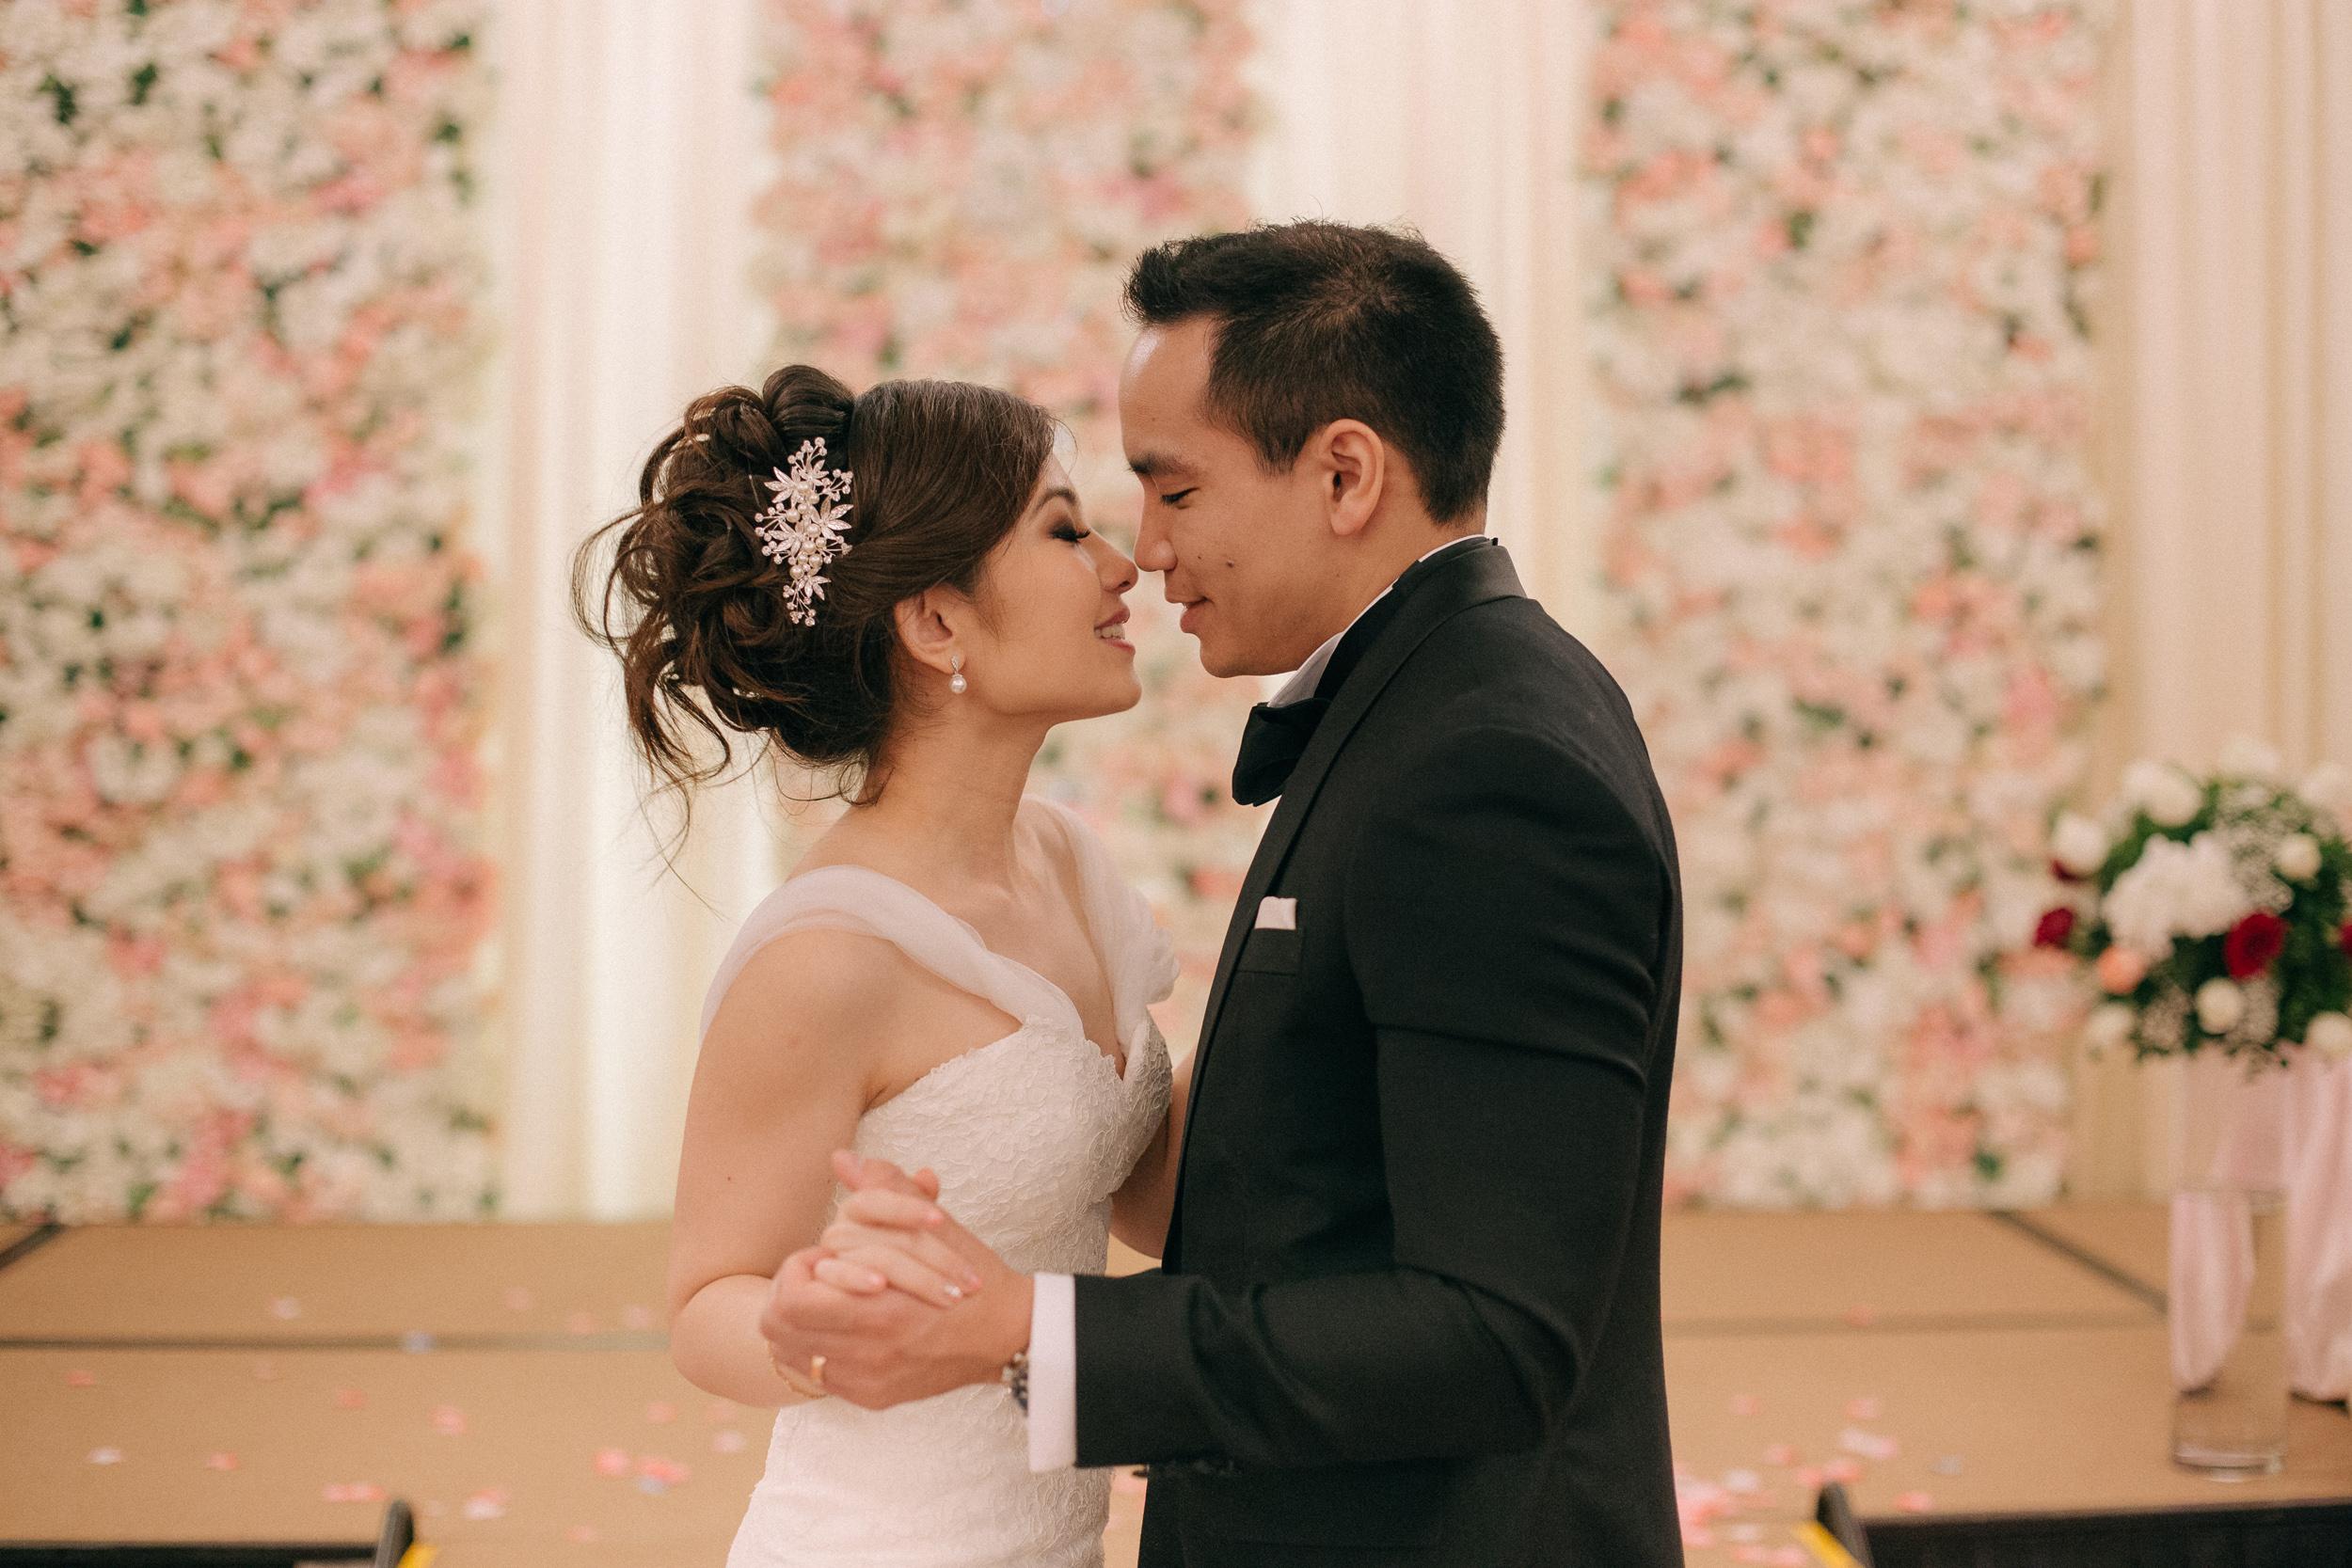 singapore-wedding-photographer-cheryl-matthew-fullerton-hotel-wedding-81.jpg